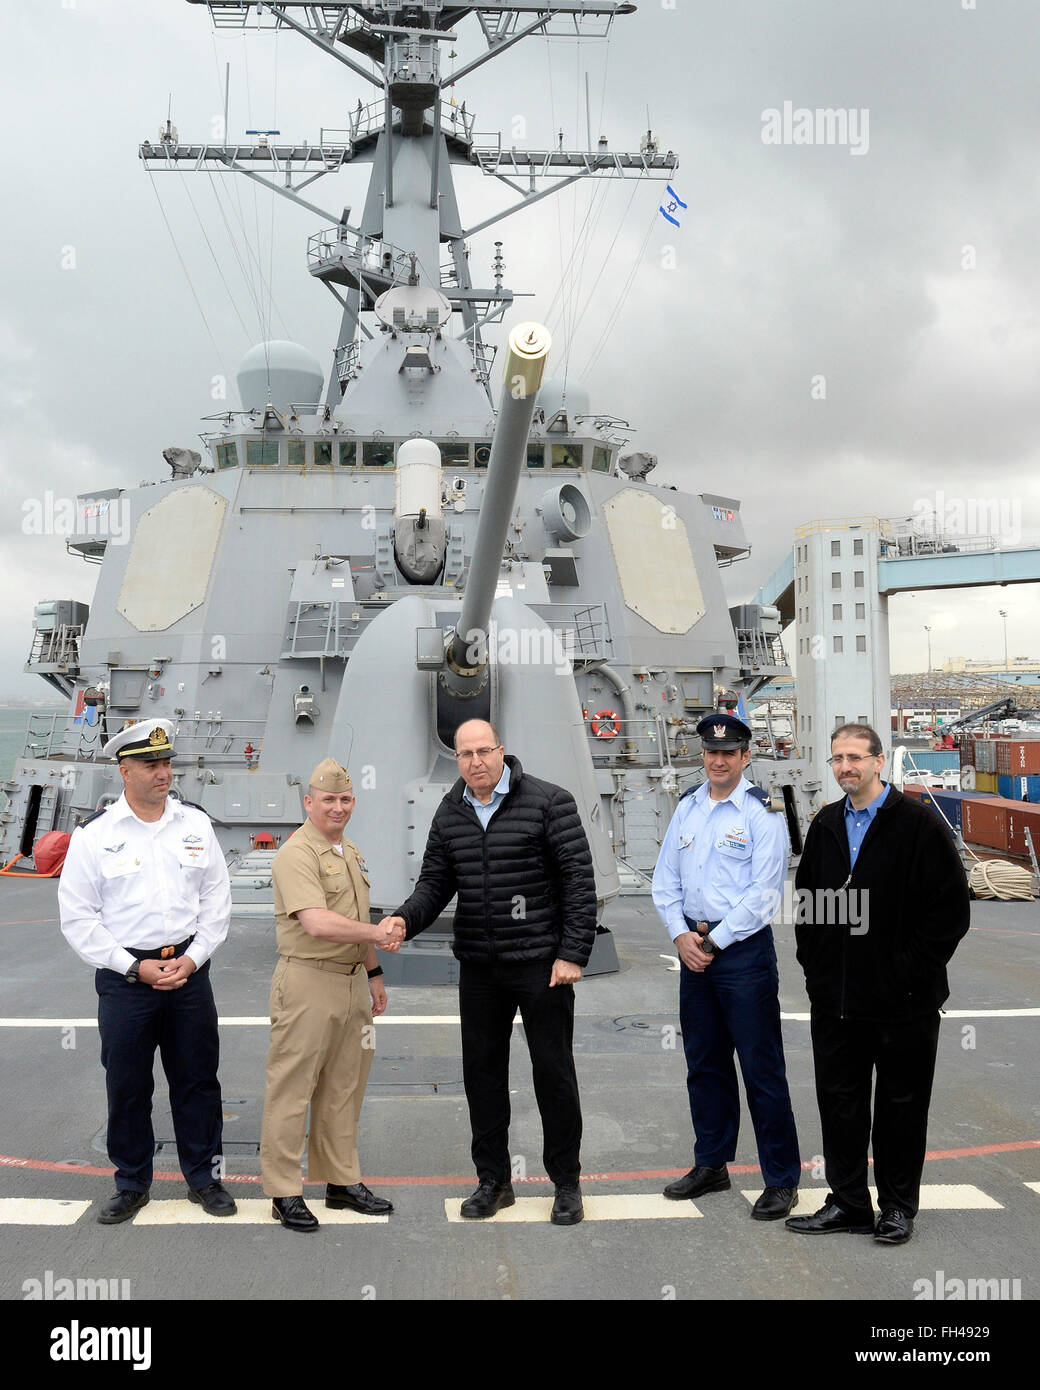 U.S. Ambassador to Israel Dan Shapiro hosted Israeli Minister of Defense Moshe Ya'alon for a visit and tour aboard - Stock Image